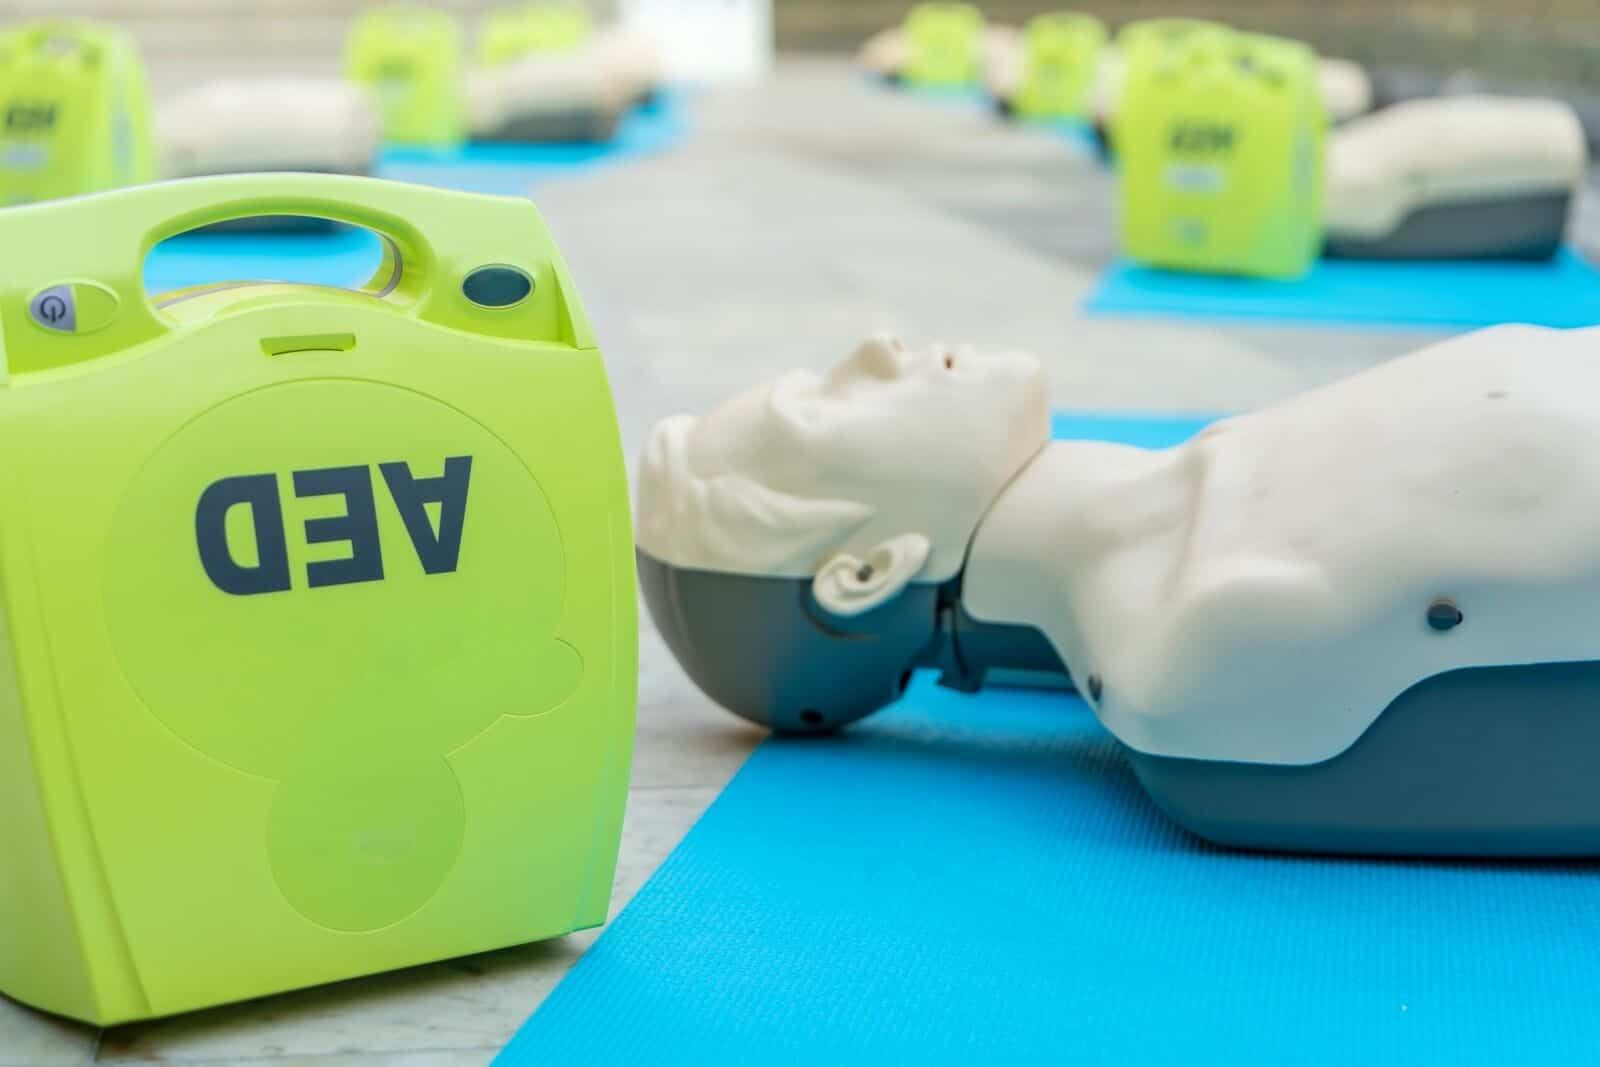 defibrillateur arrêt cardio-respiratoire